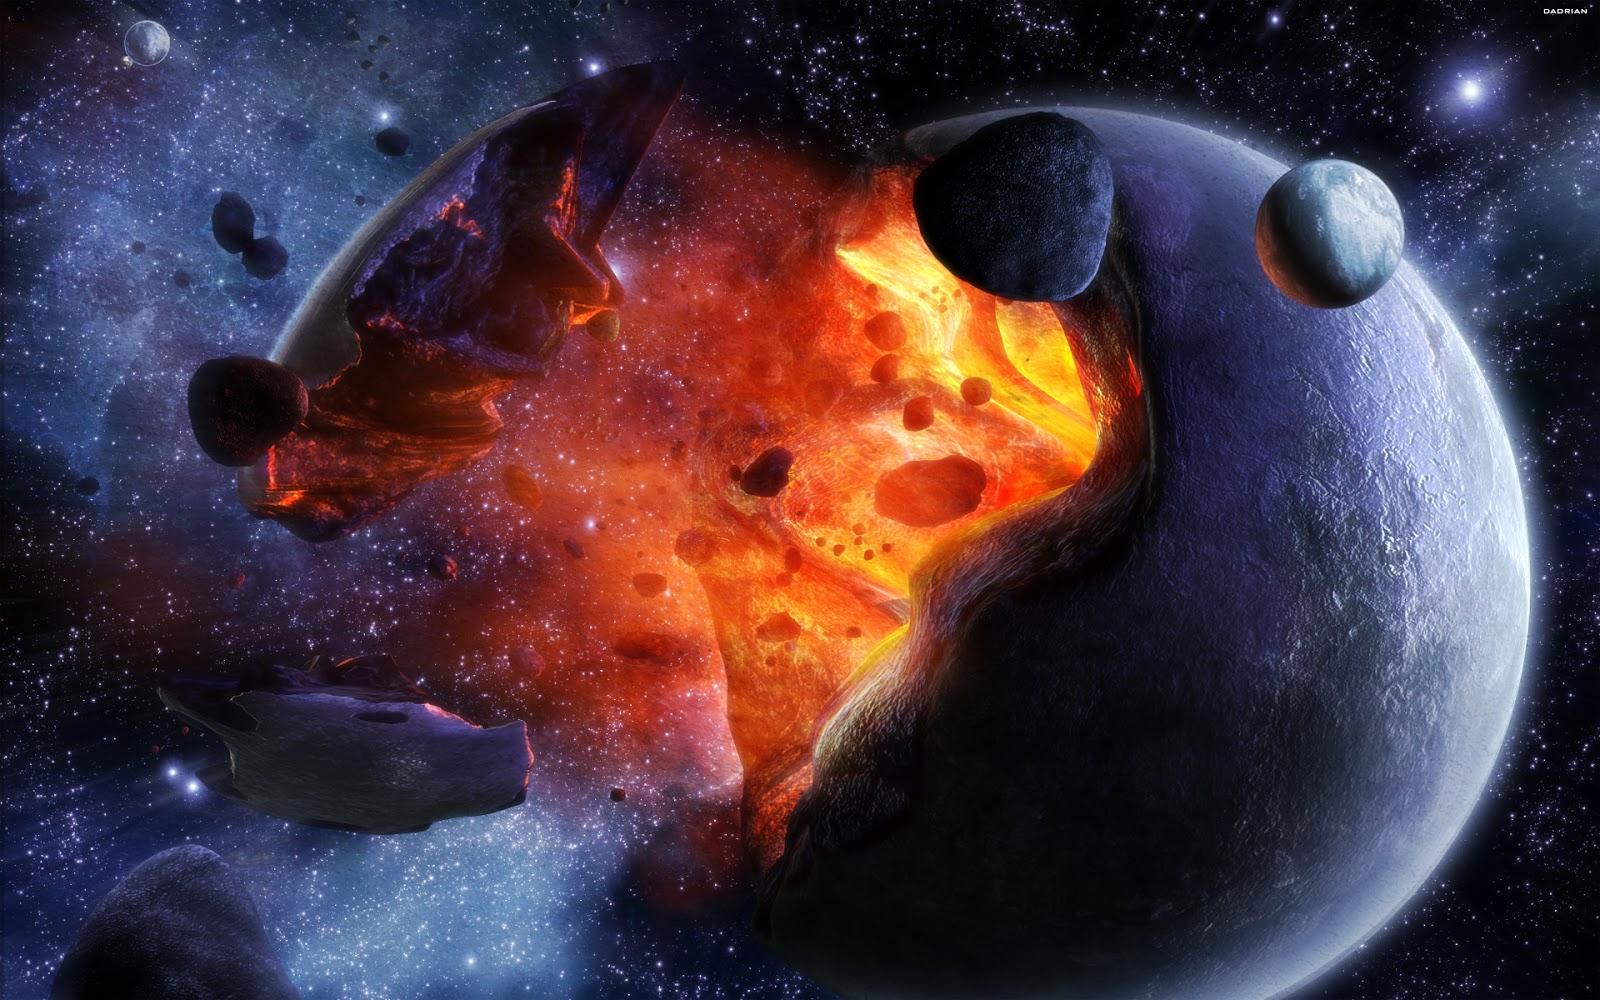 Exploding Planet Earth wallpaper 1080p